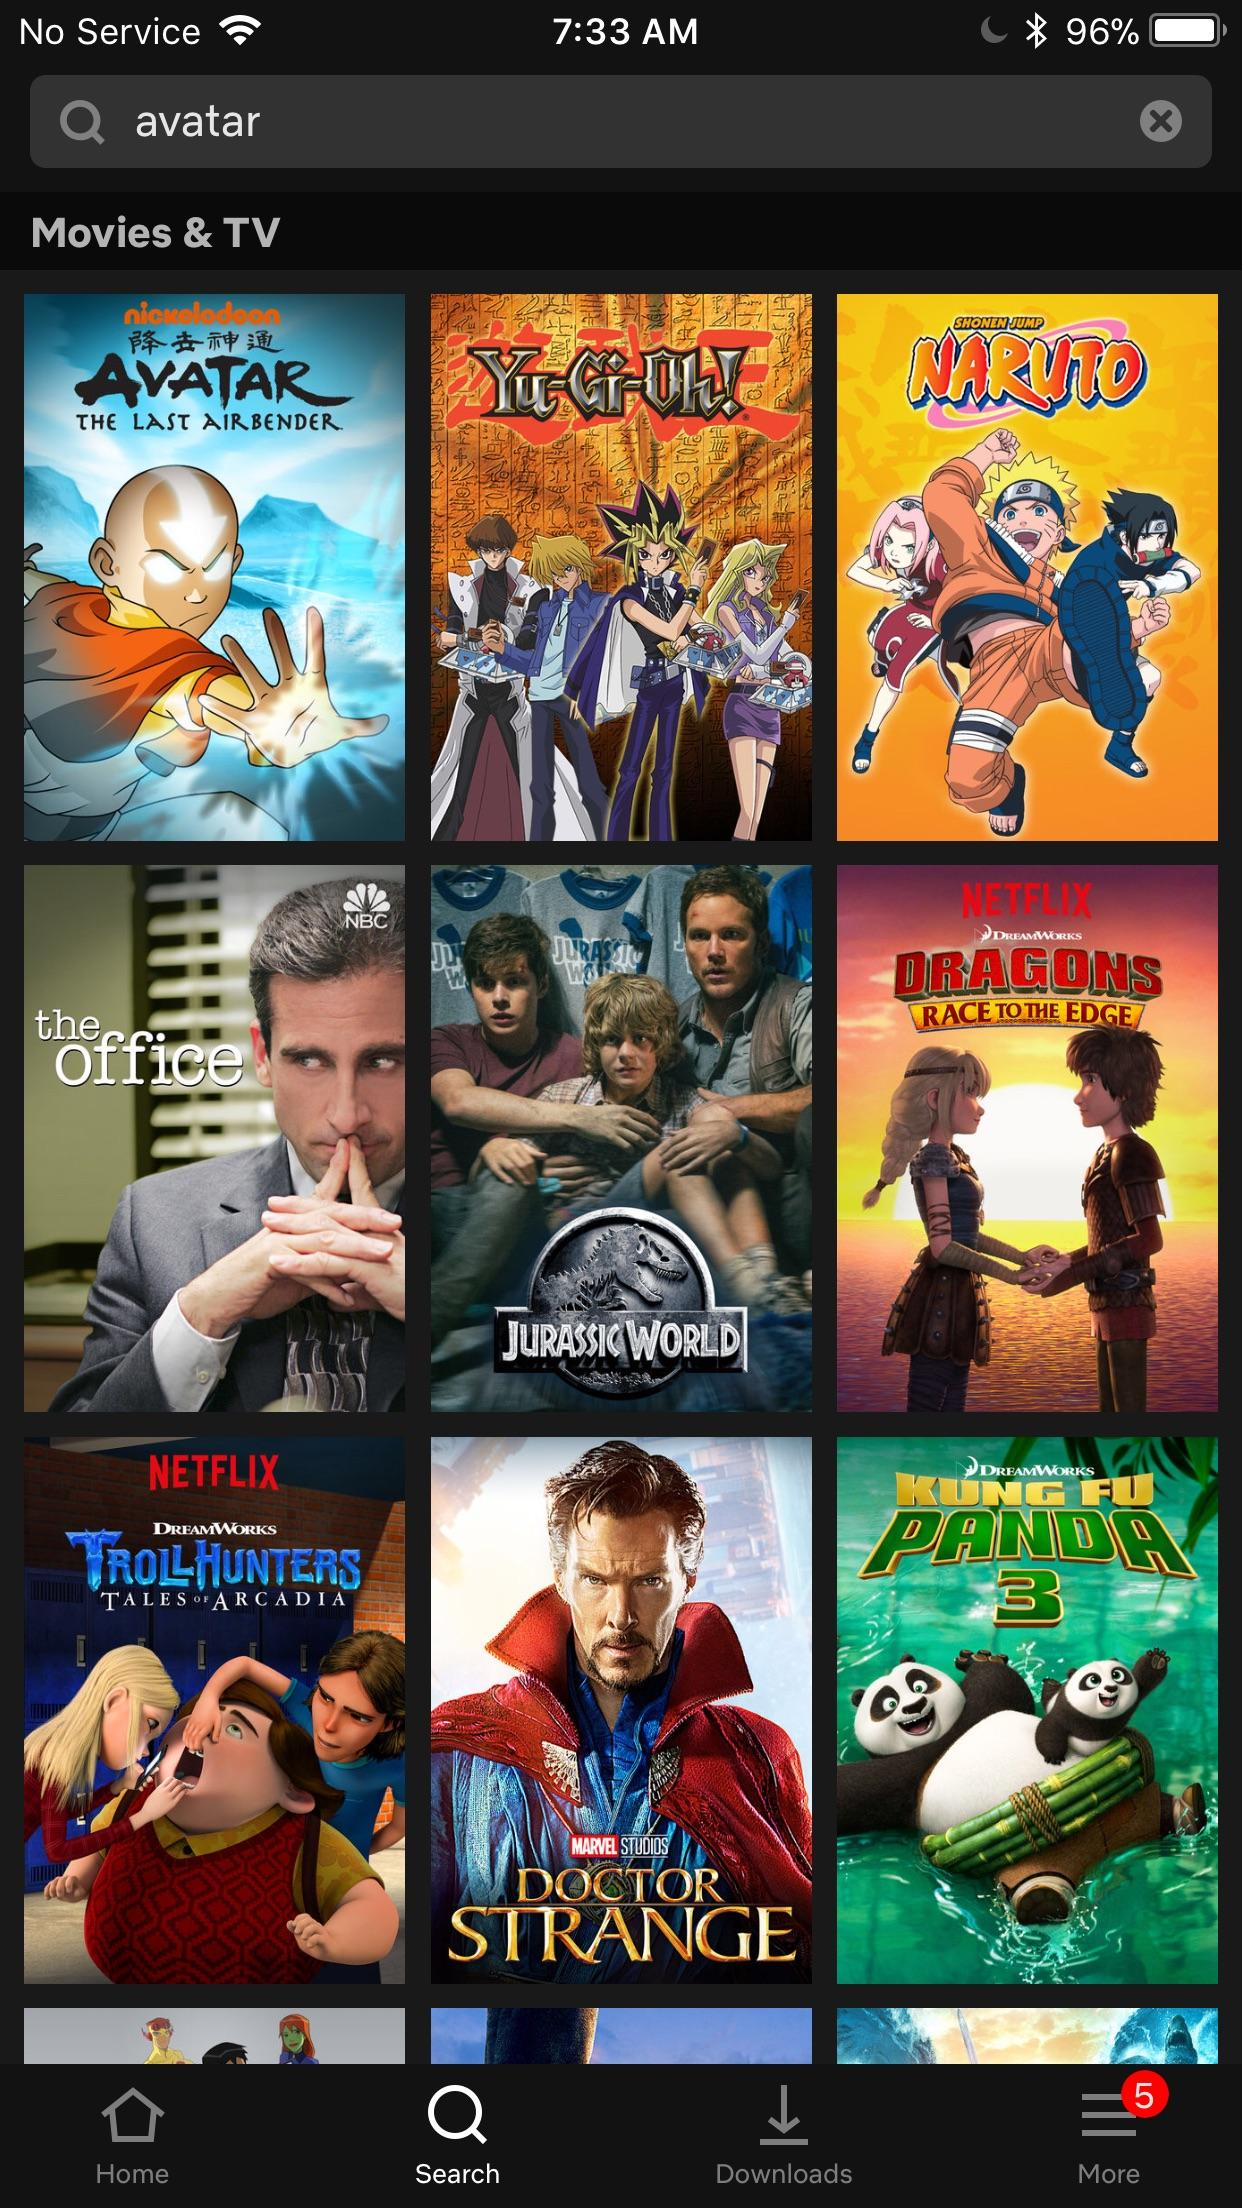 The Legend Of Korra Netflix Canada : legend, korra, netflix, canada, Everyone, Knows., Airbender, Canadian, Netflix., TheLastAirbender